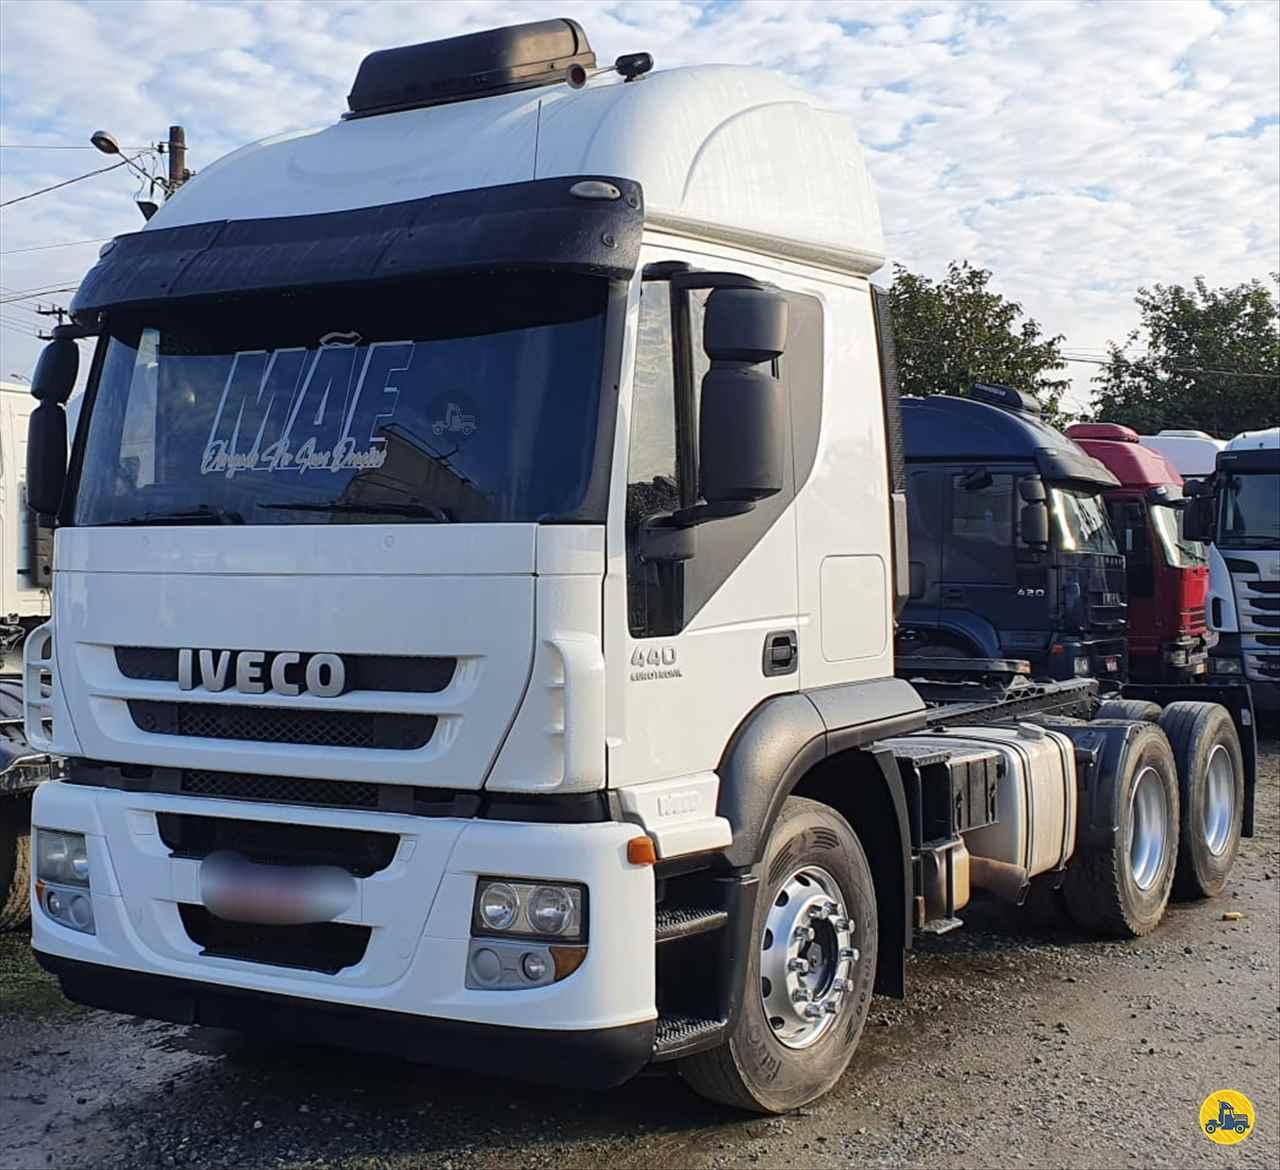 STRALIS 440 de Trevo Caminhões - AGB - ITAJAI/SC